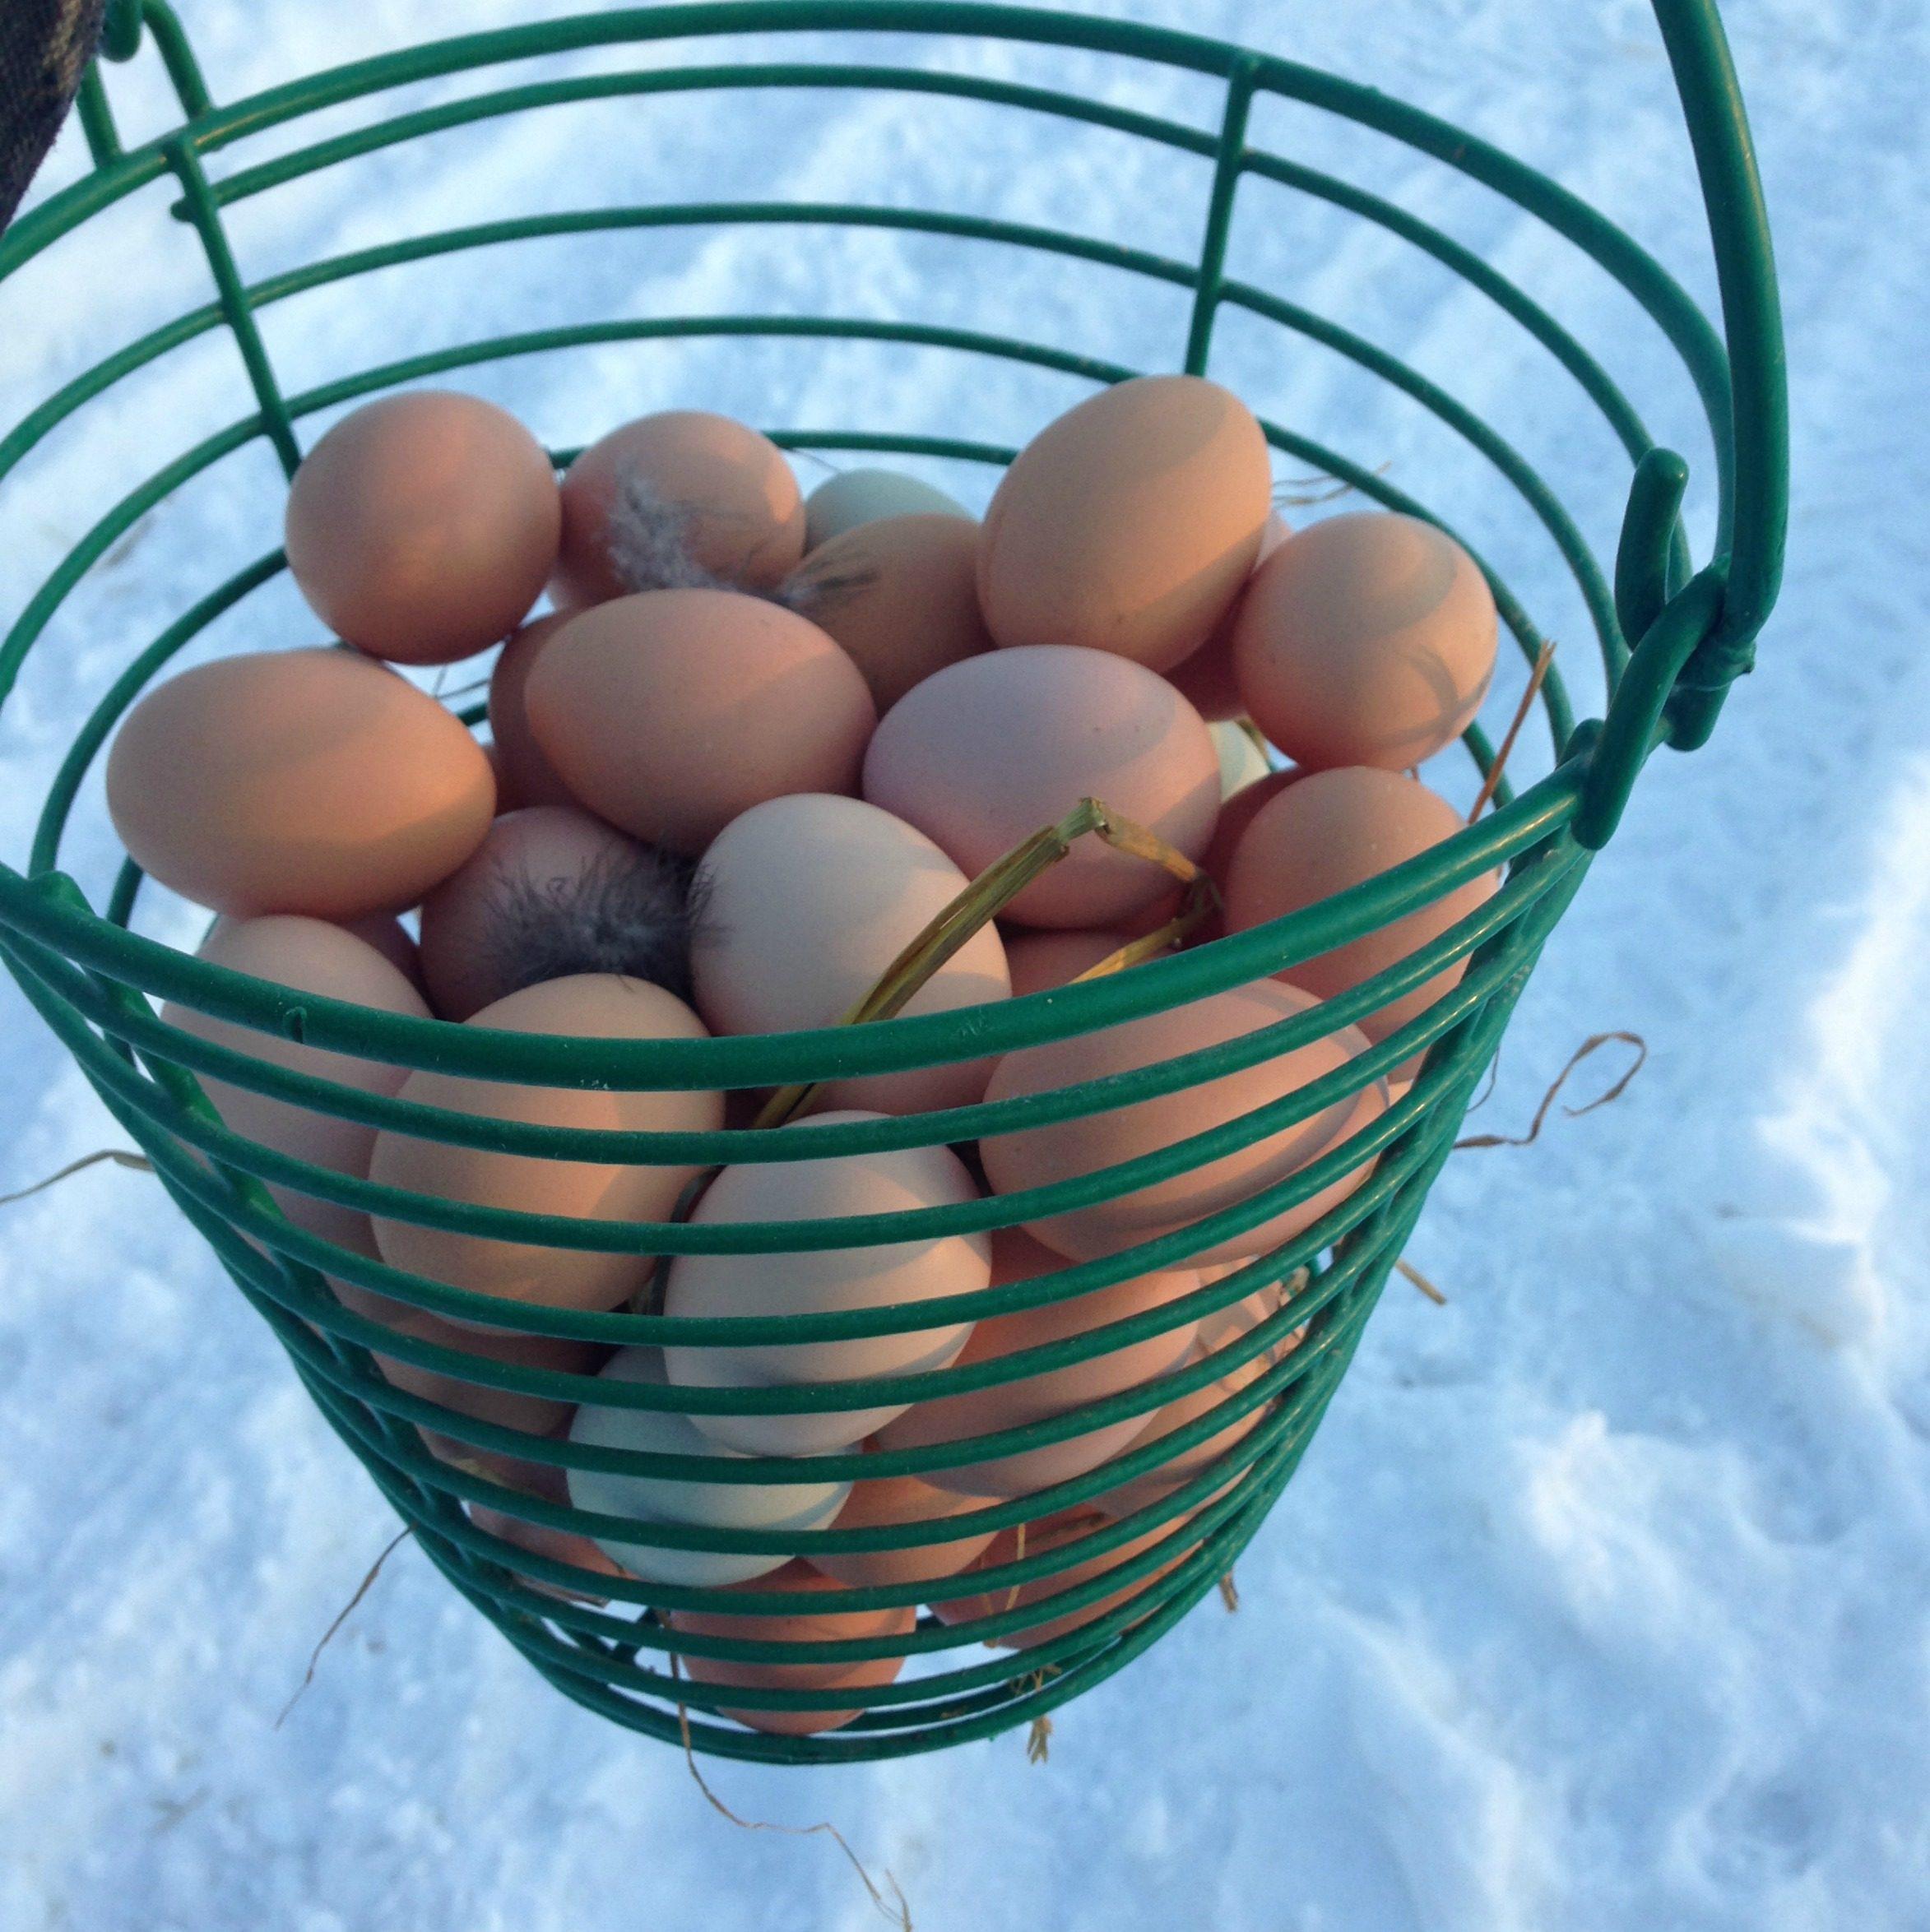 eggs for sale,free range, new frontier farm, mn, minnesota, family farm, organic, brown eggs, free range, food blog